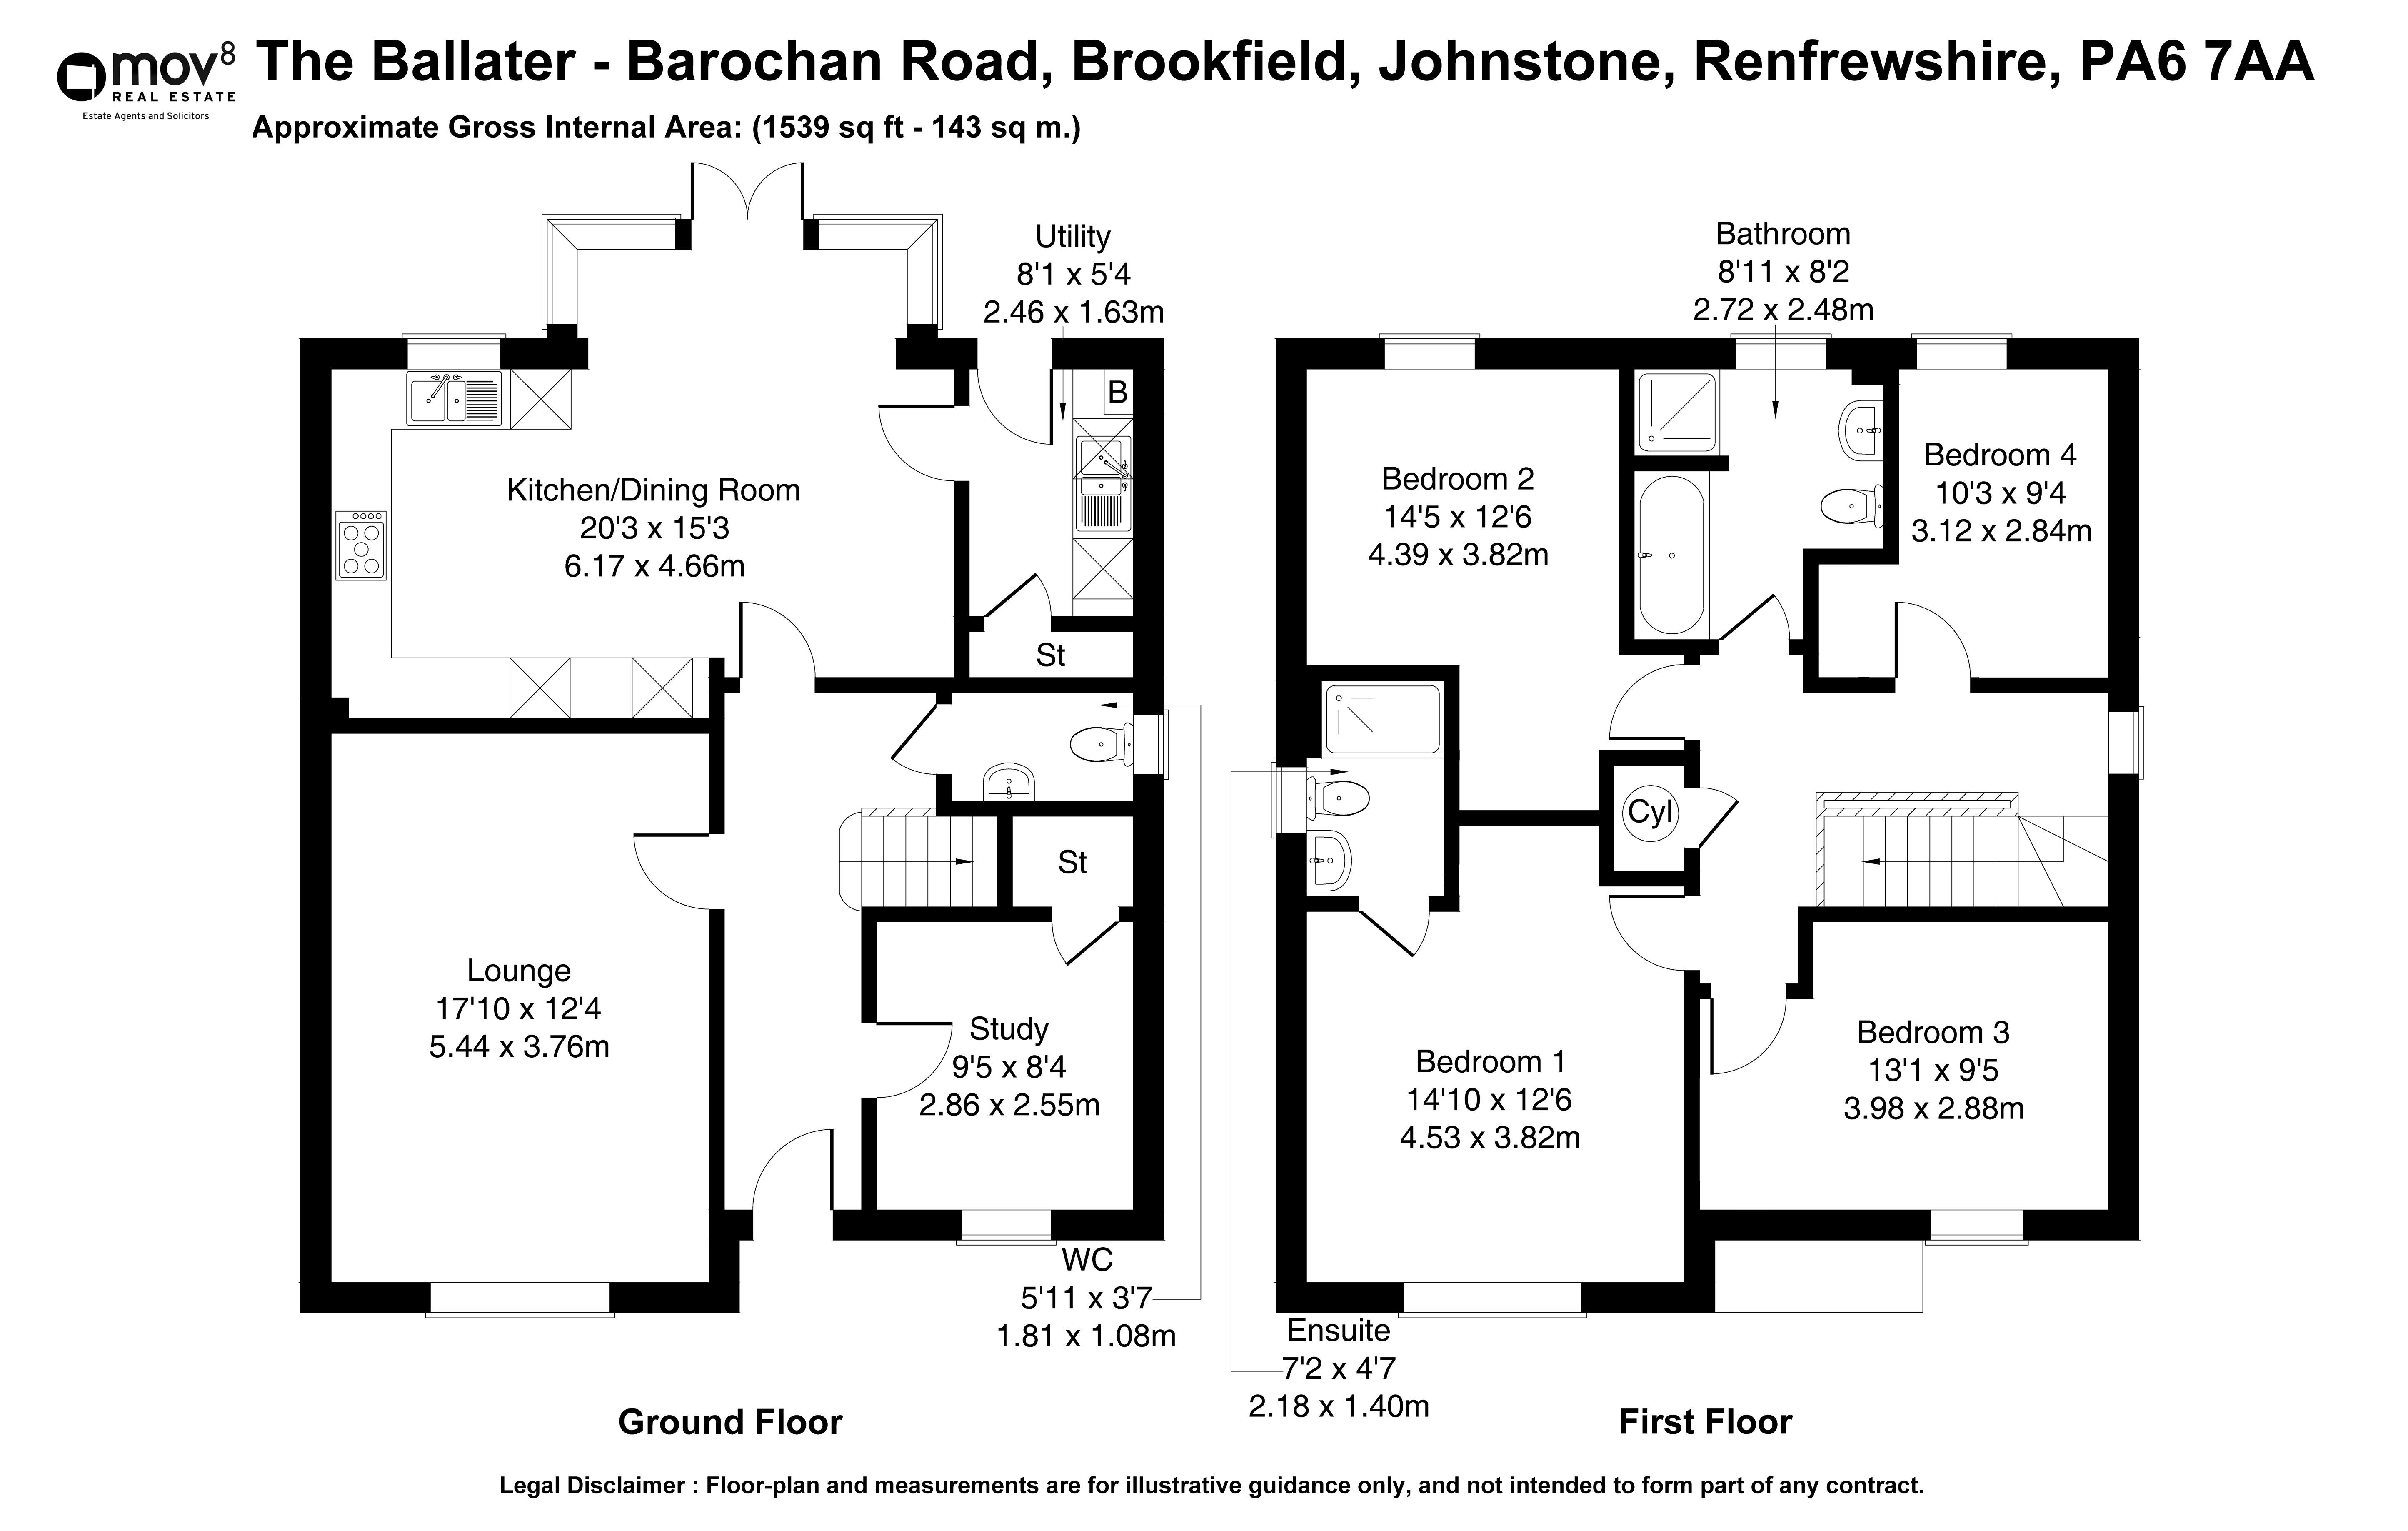 Floorplan 1 of Weirs Wynd , The Ballater Barochan Road, Brookfield, Johnstone, Renfrewshire, PA6 7AA